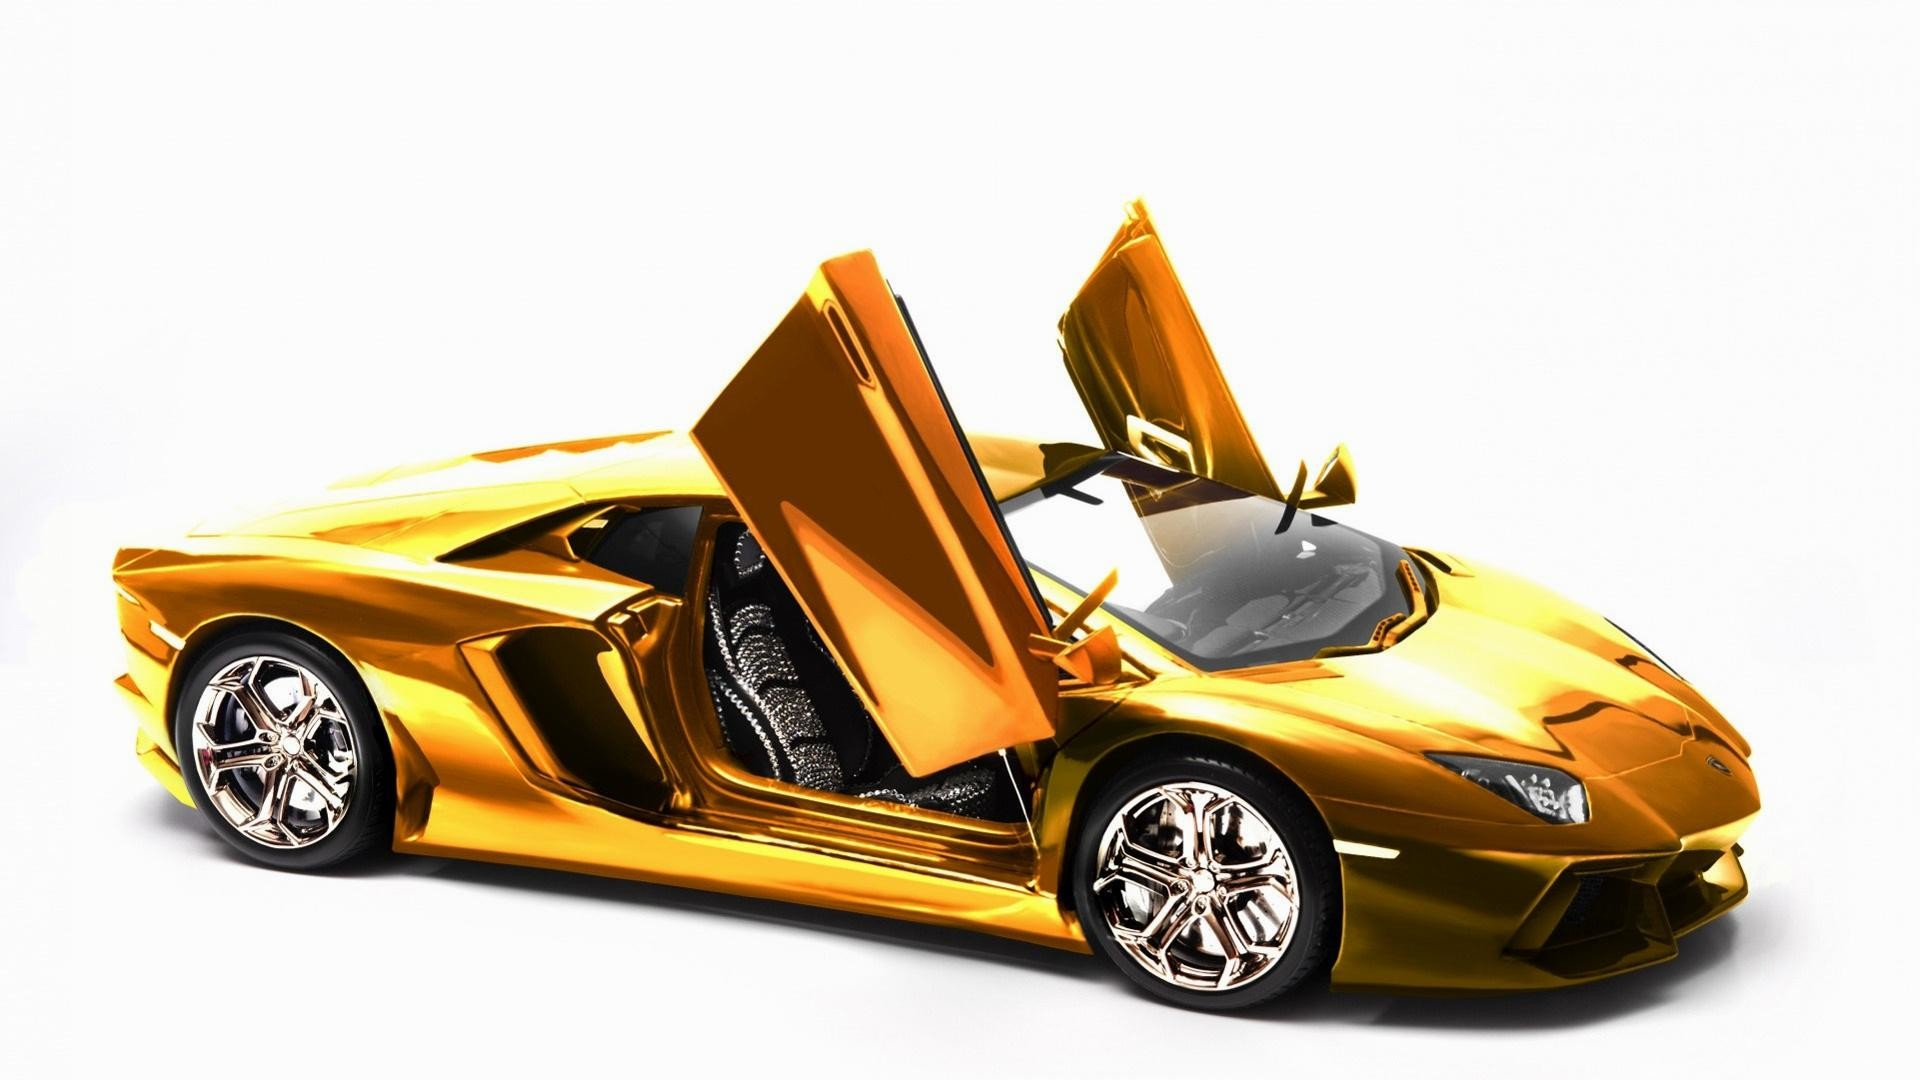 Cool-Cars-Live-Cars-Pics-PC-NMgnCP-PC-